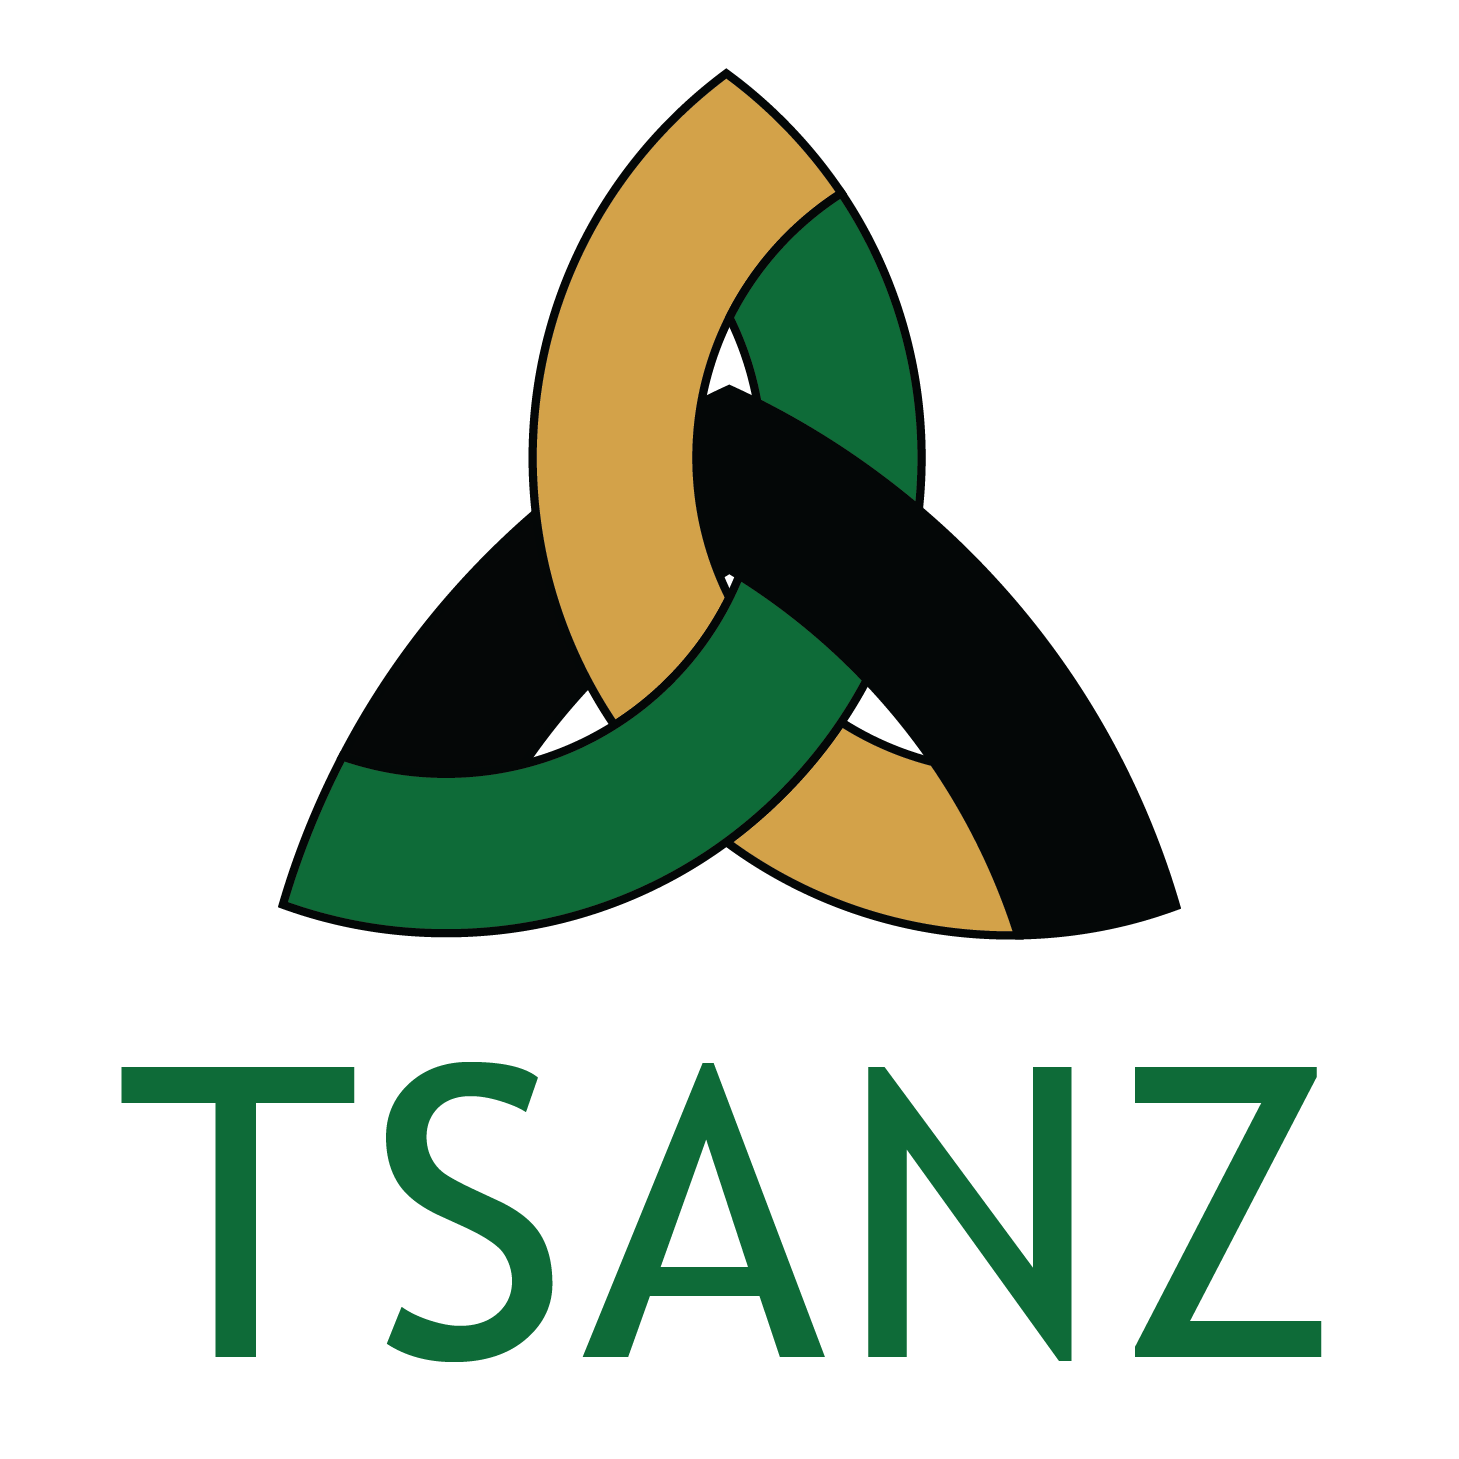 TSANZ